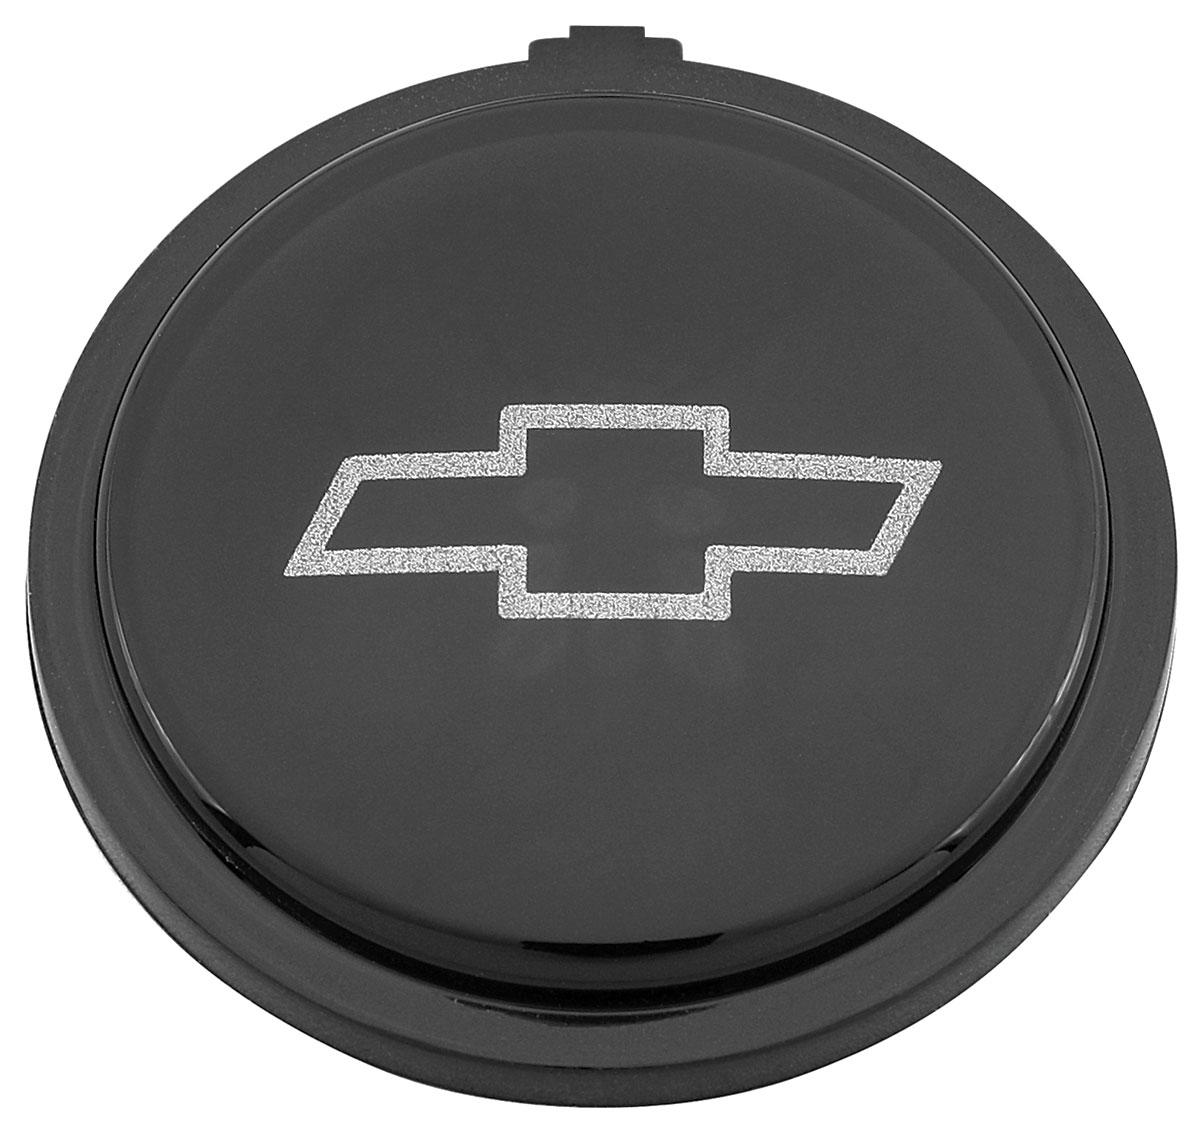 Emblem, Horn Button, Sport Steering Wheel, 1971-77 CH/EC/MC, Black